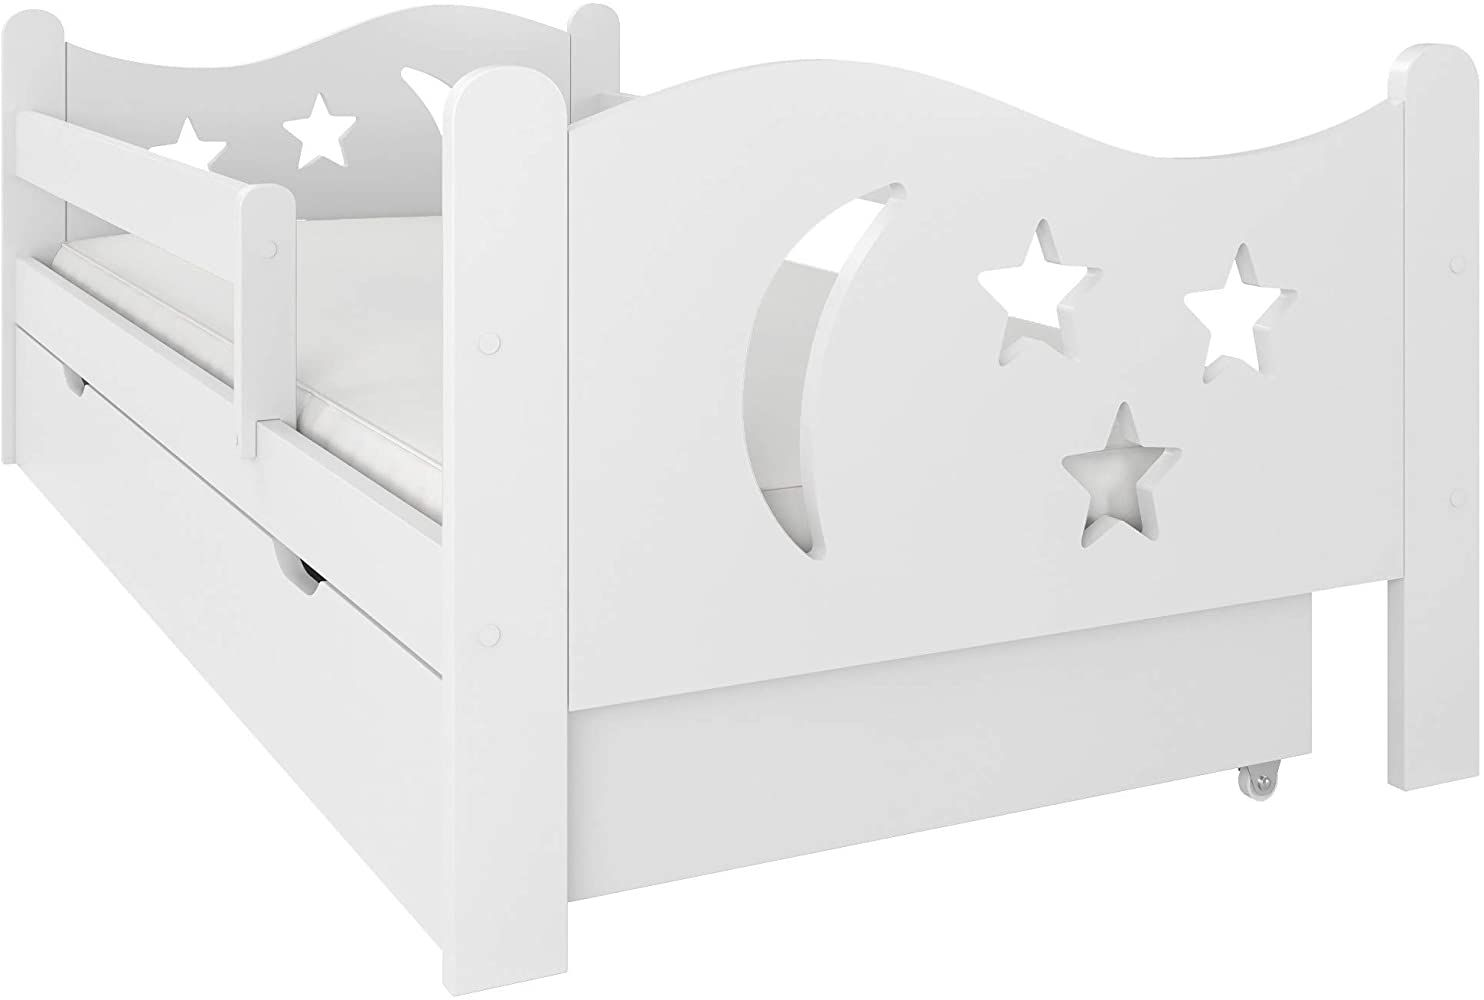 Needsleep Rausfallschutz Kinderbett Komplett Bett Mit Matratze